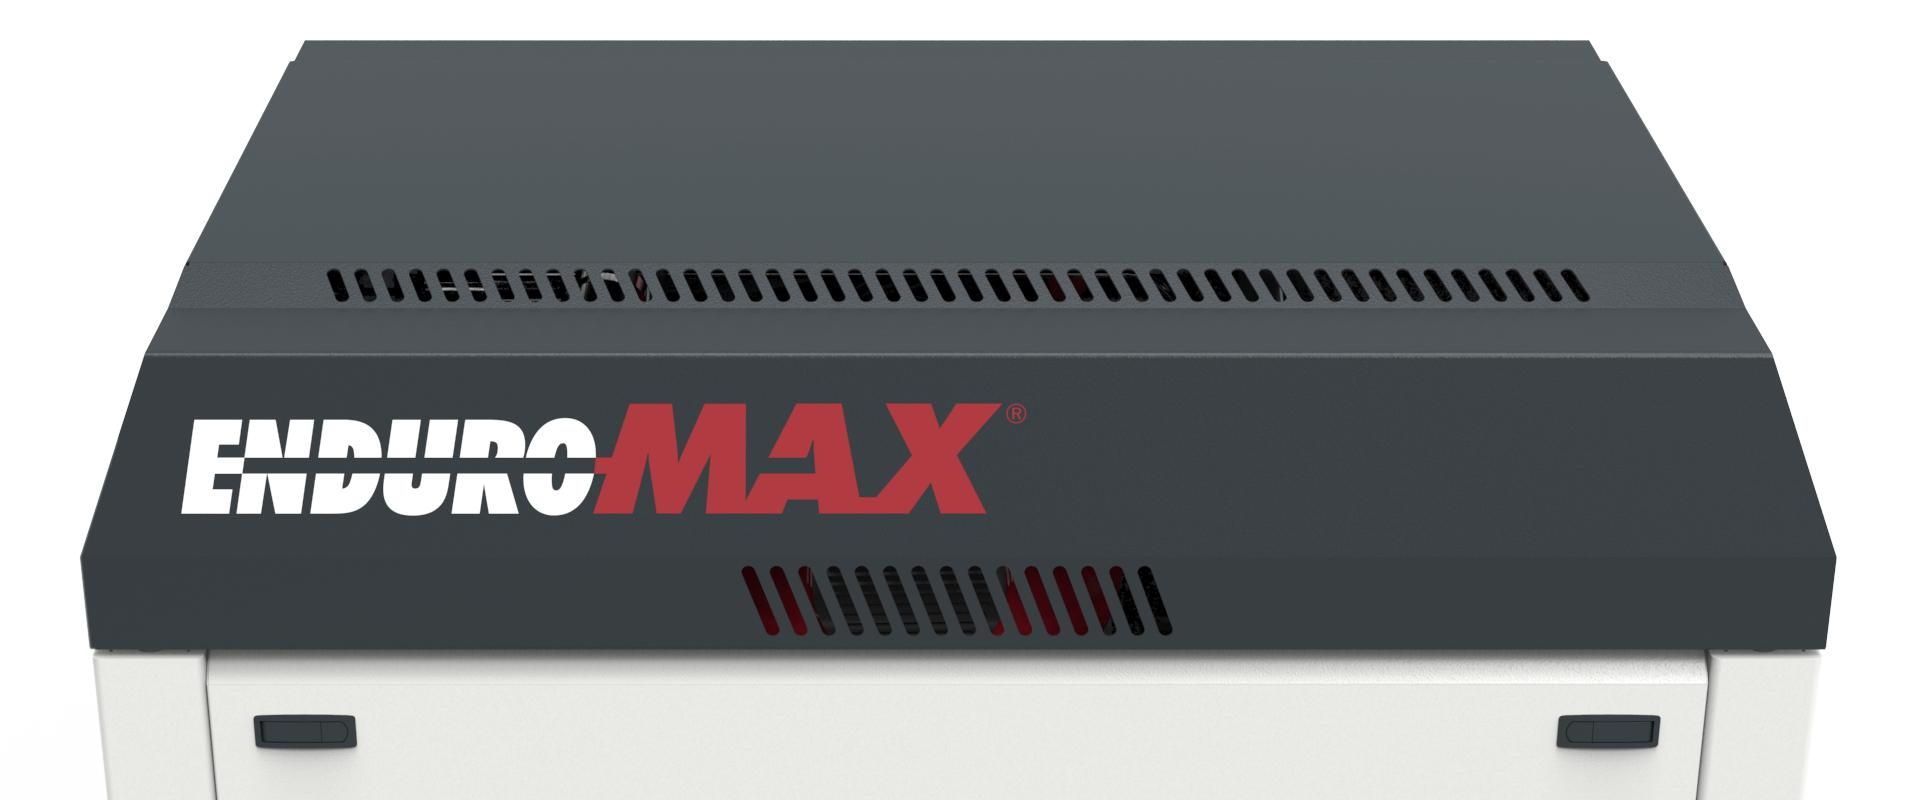 omax-enduromax-branding-pump-front